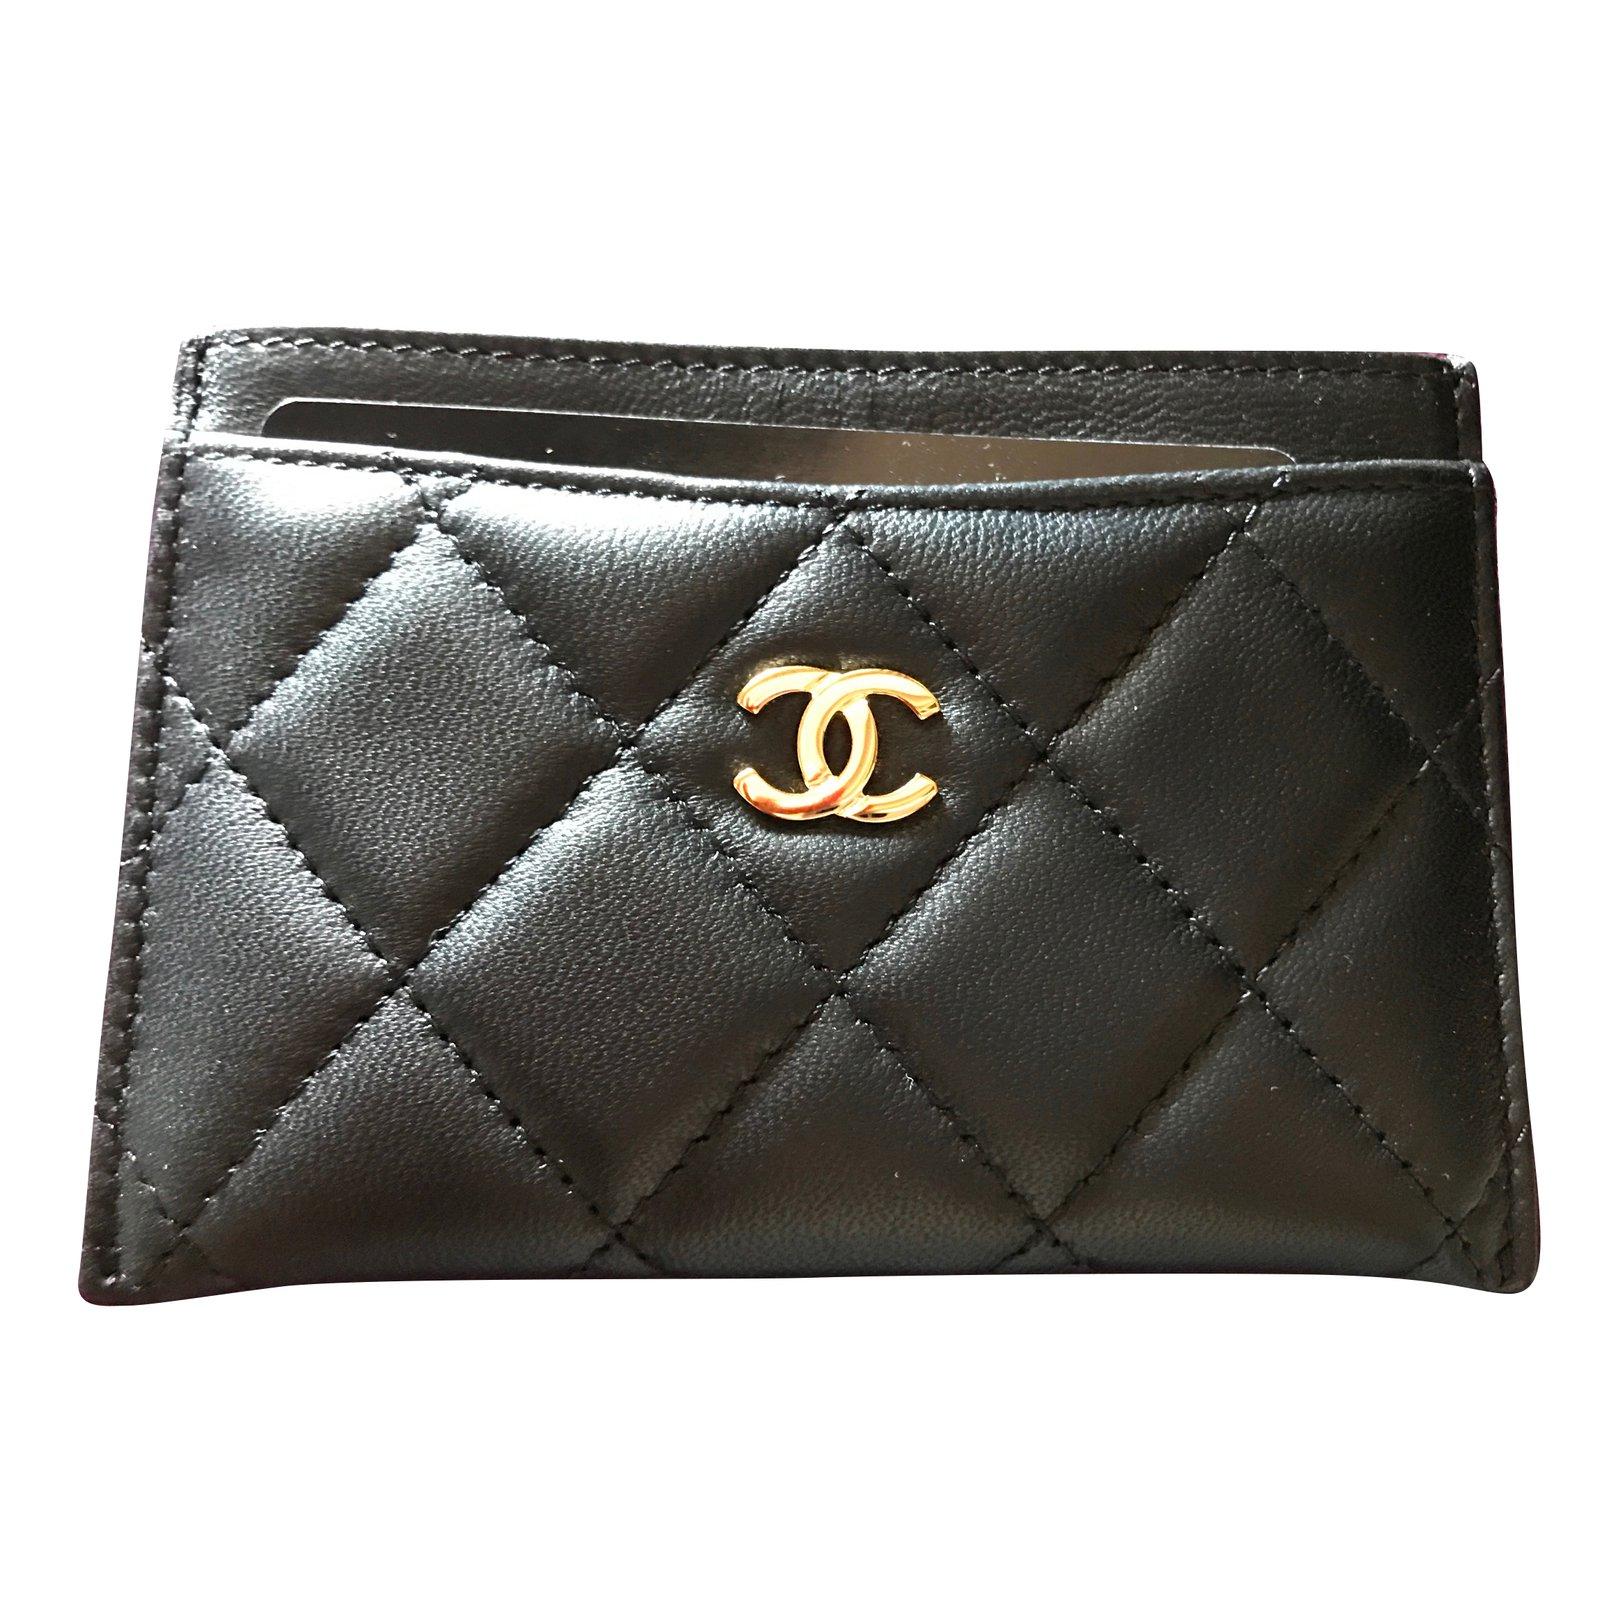 chanel card holder wallets leather black ref45262 joli